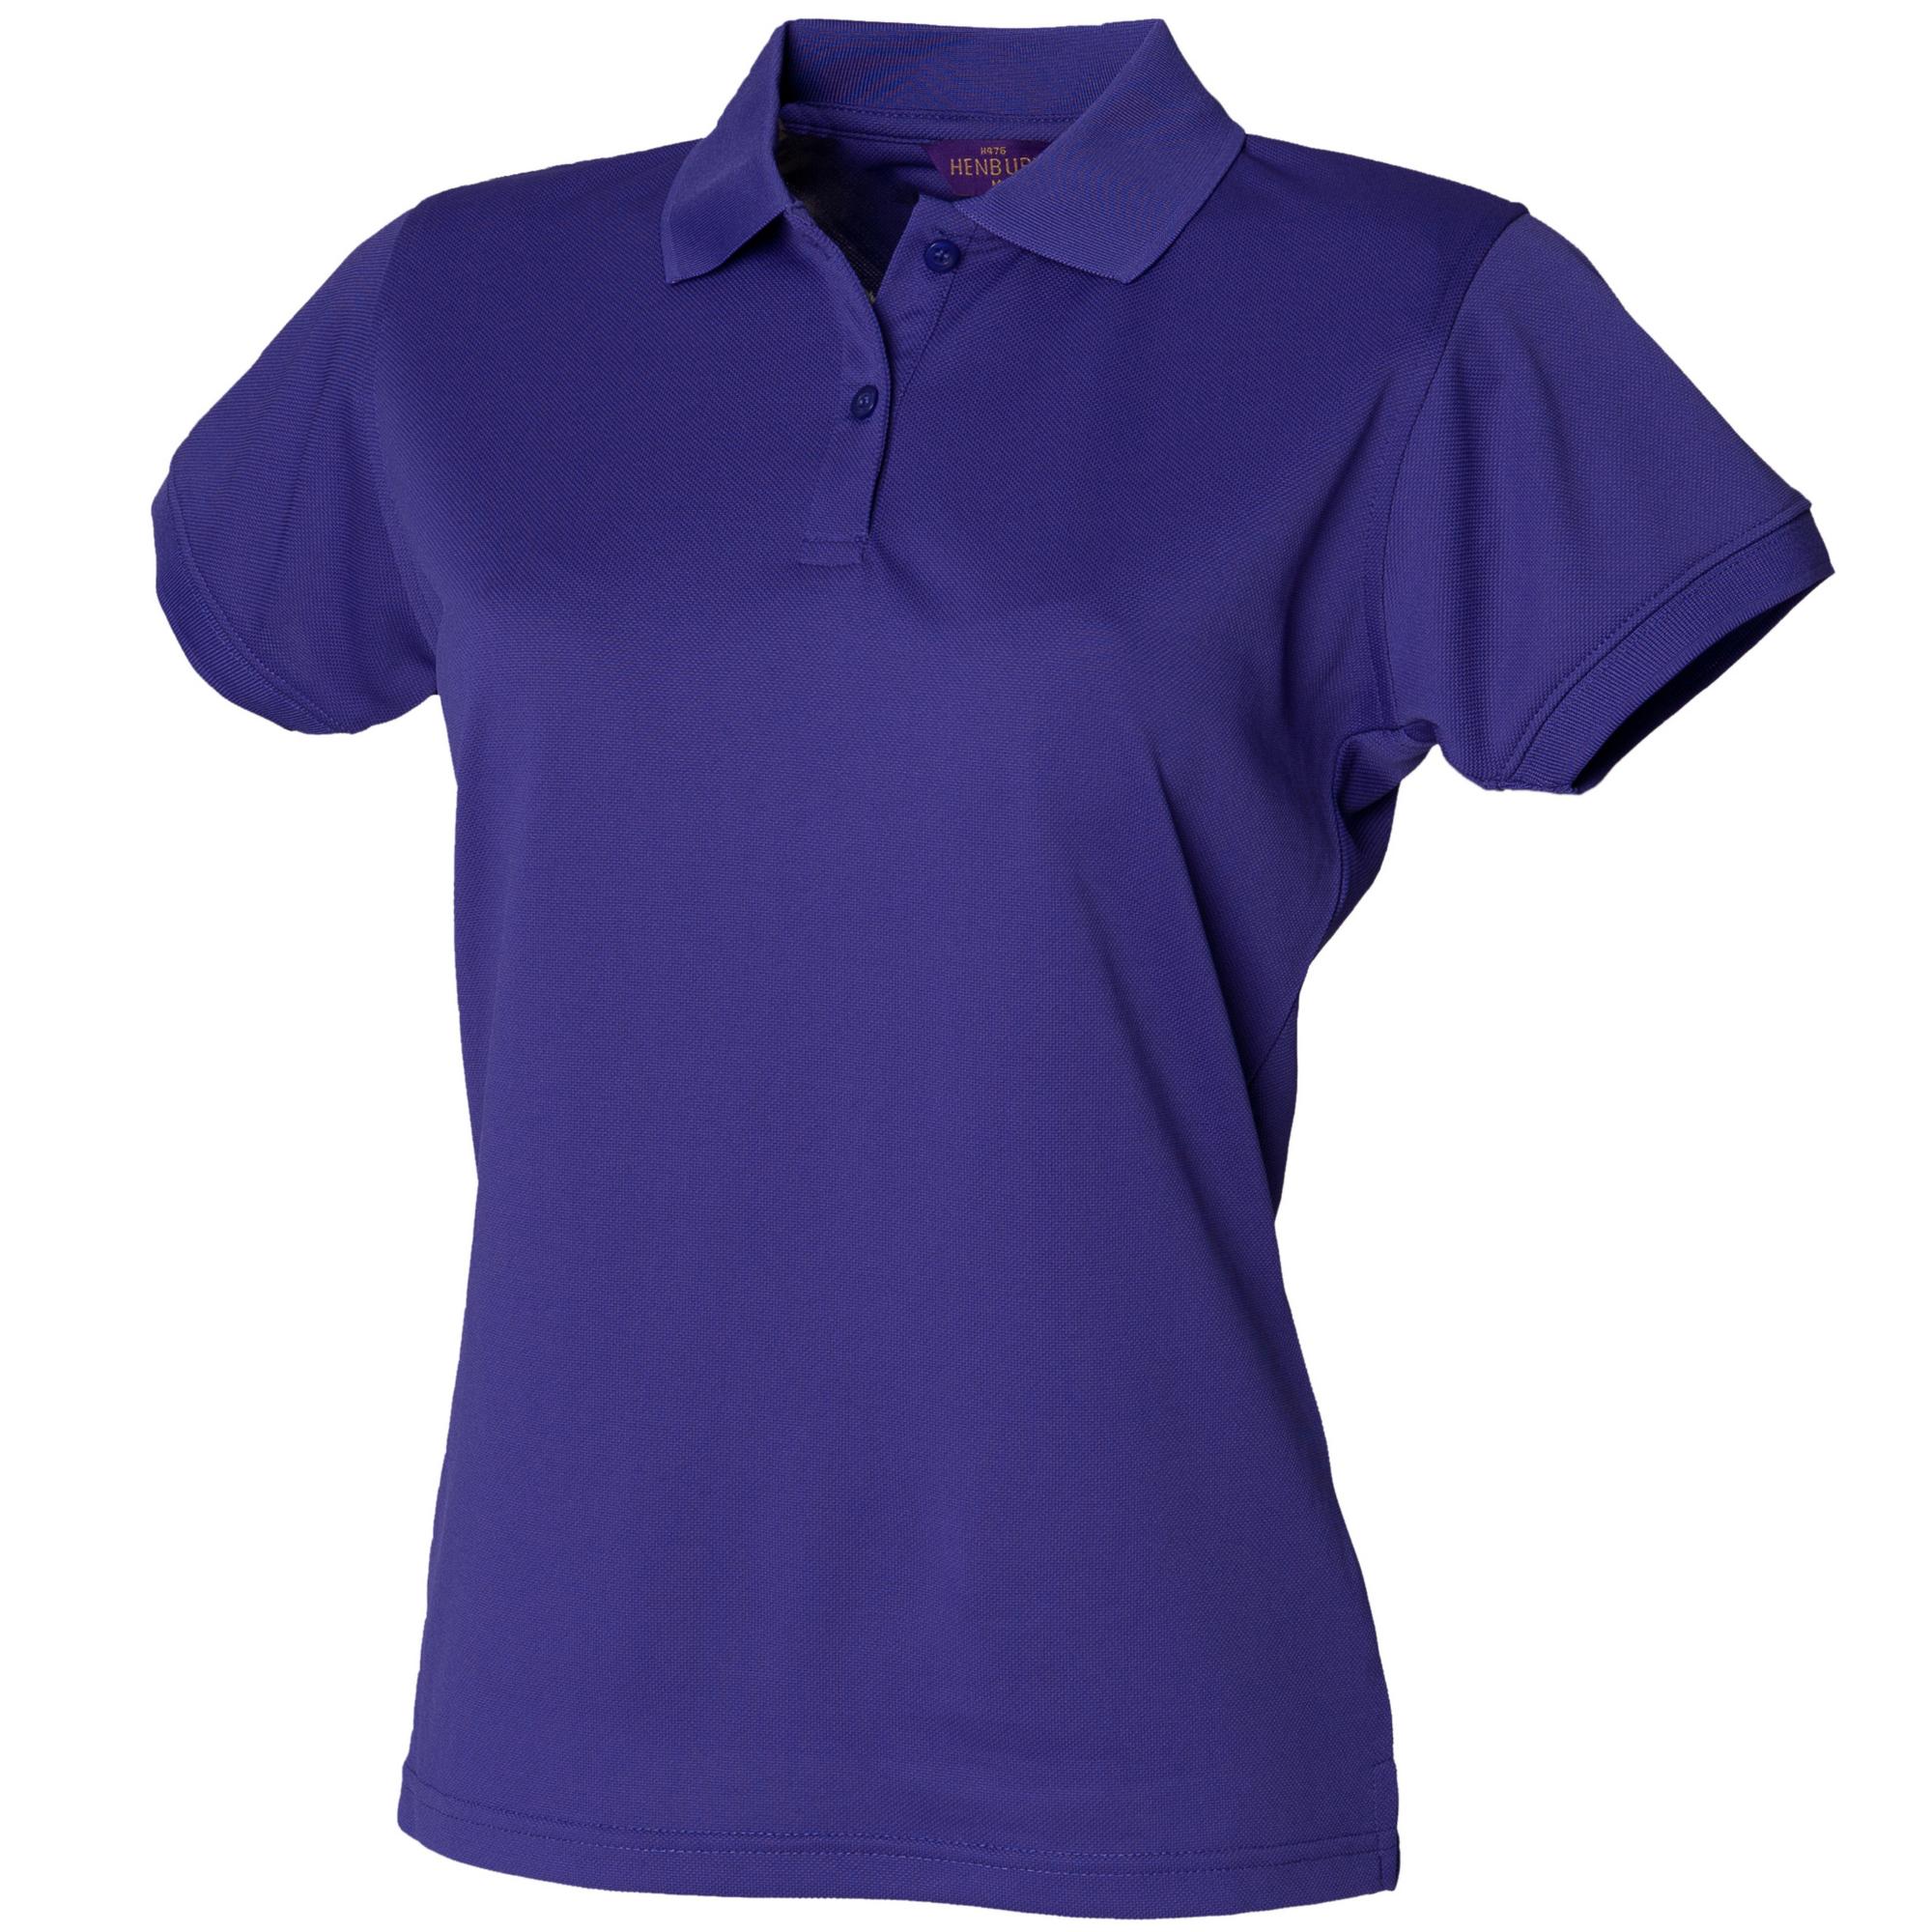 Henbury Womens/Ladies Coolplus Fitted Polo Shirt | eBay